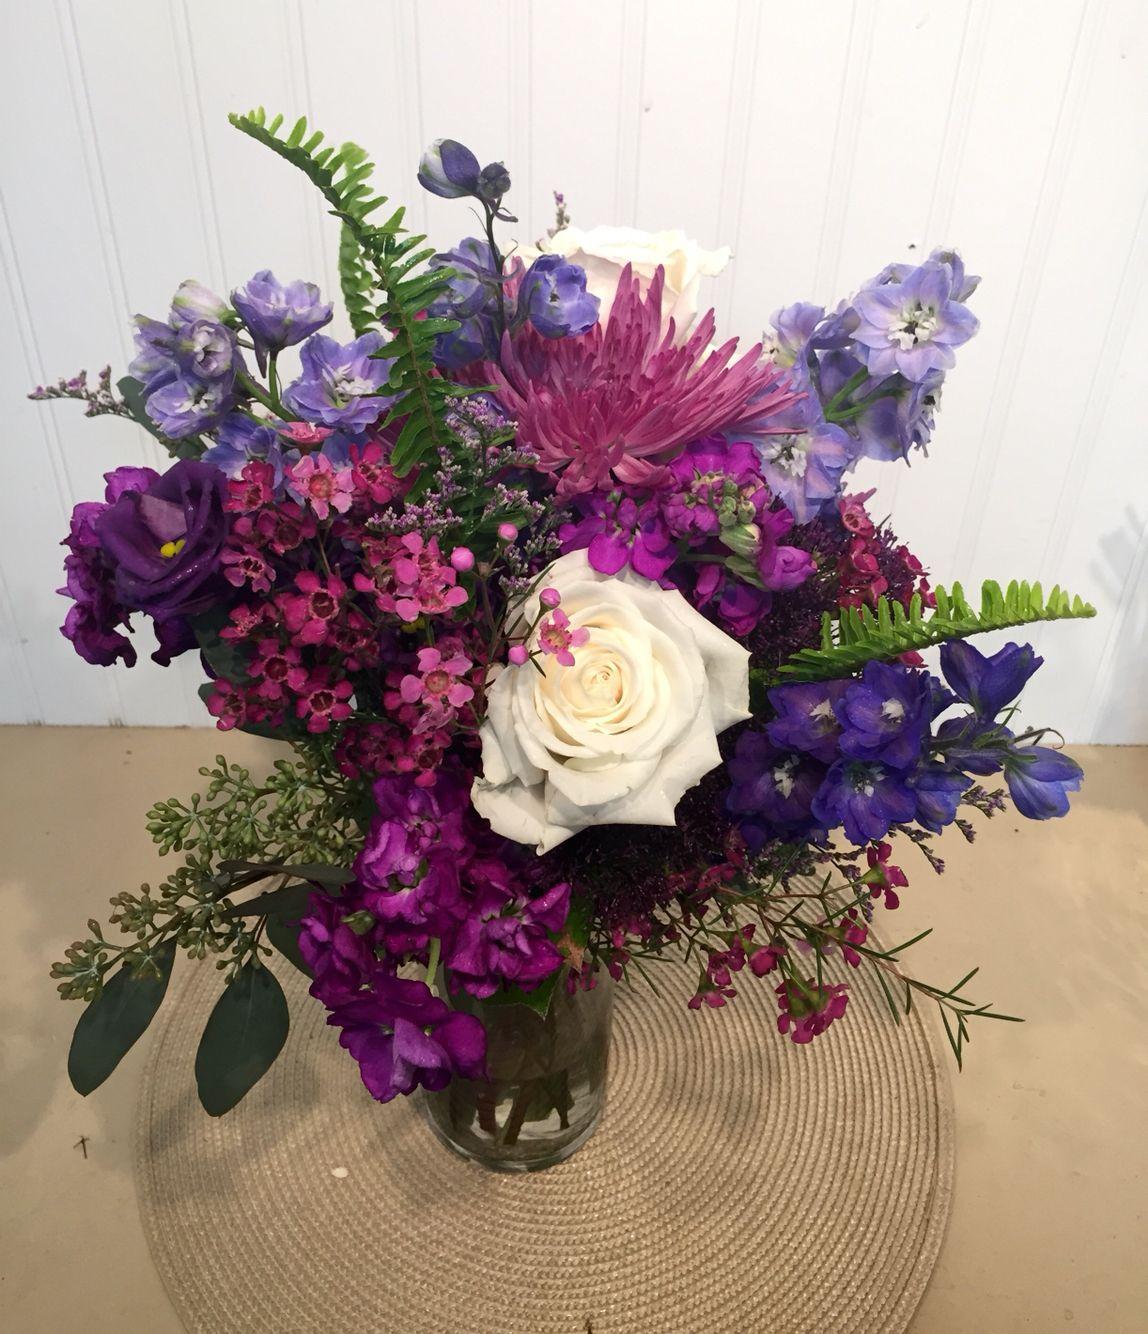 A Breathtaking Purple Bridal Bouquet With Fuji Mums Roses Delphinium Stock Lisianthus Wax Flower Caspia Purple Bridal Bouquet Wedding Flowers Mum Bouquet